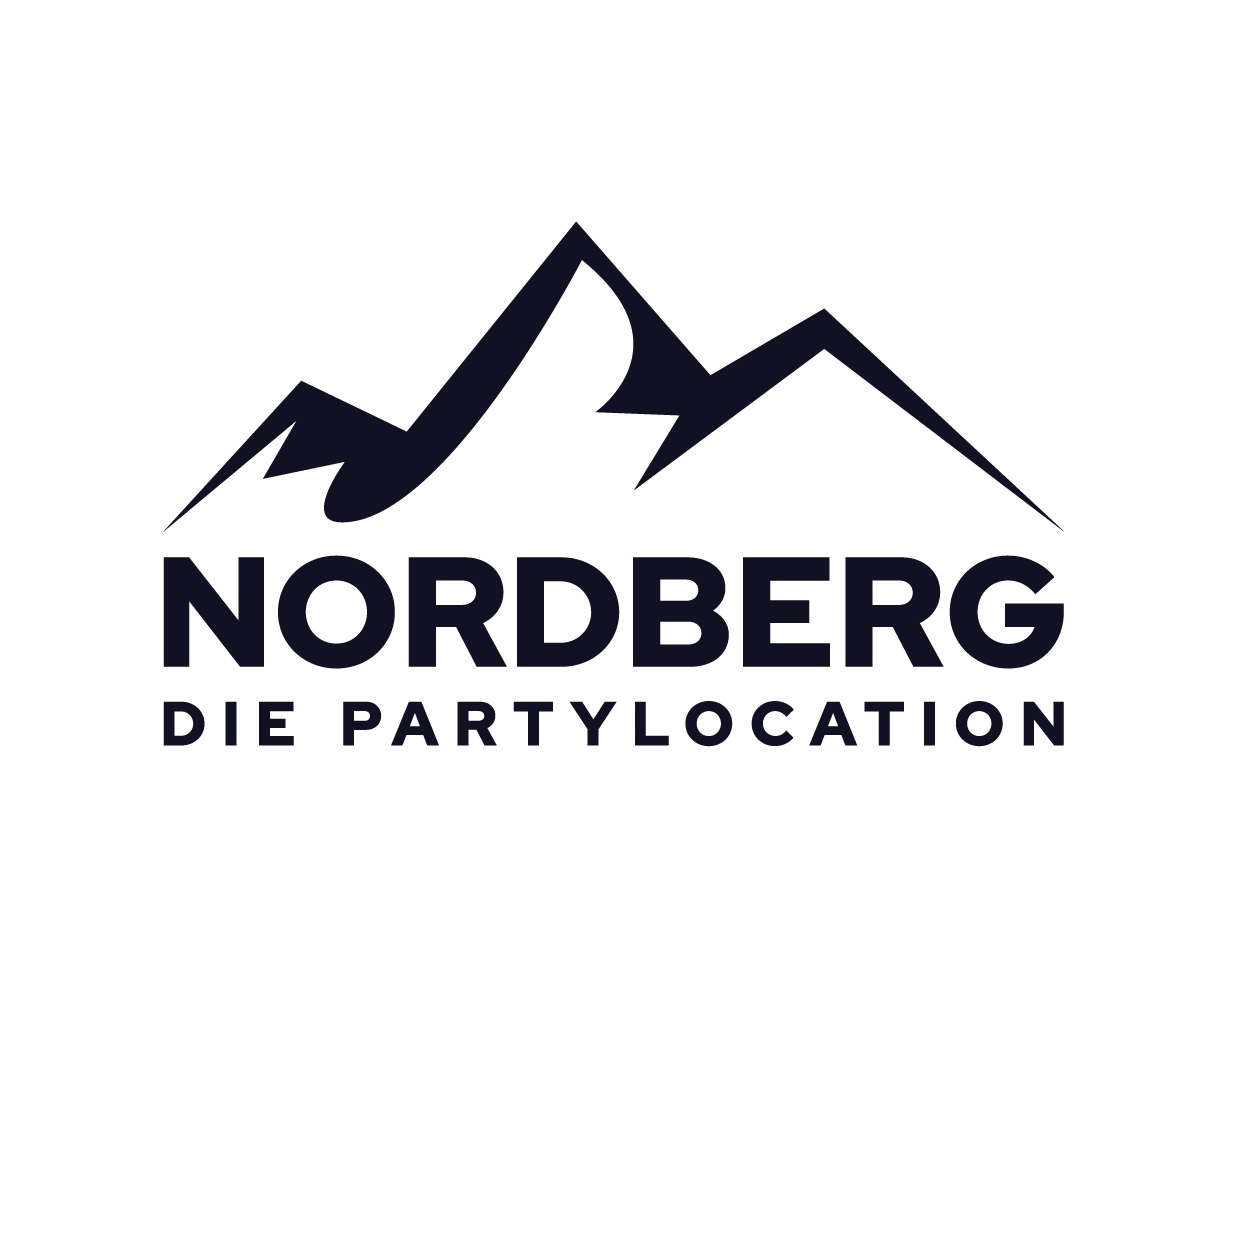 Nordberg Wien - Die Partylocation - Partyraum Wien